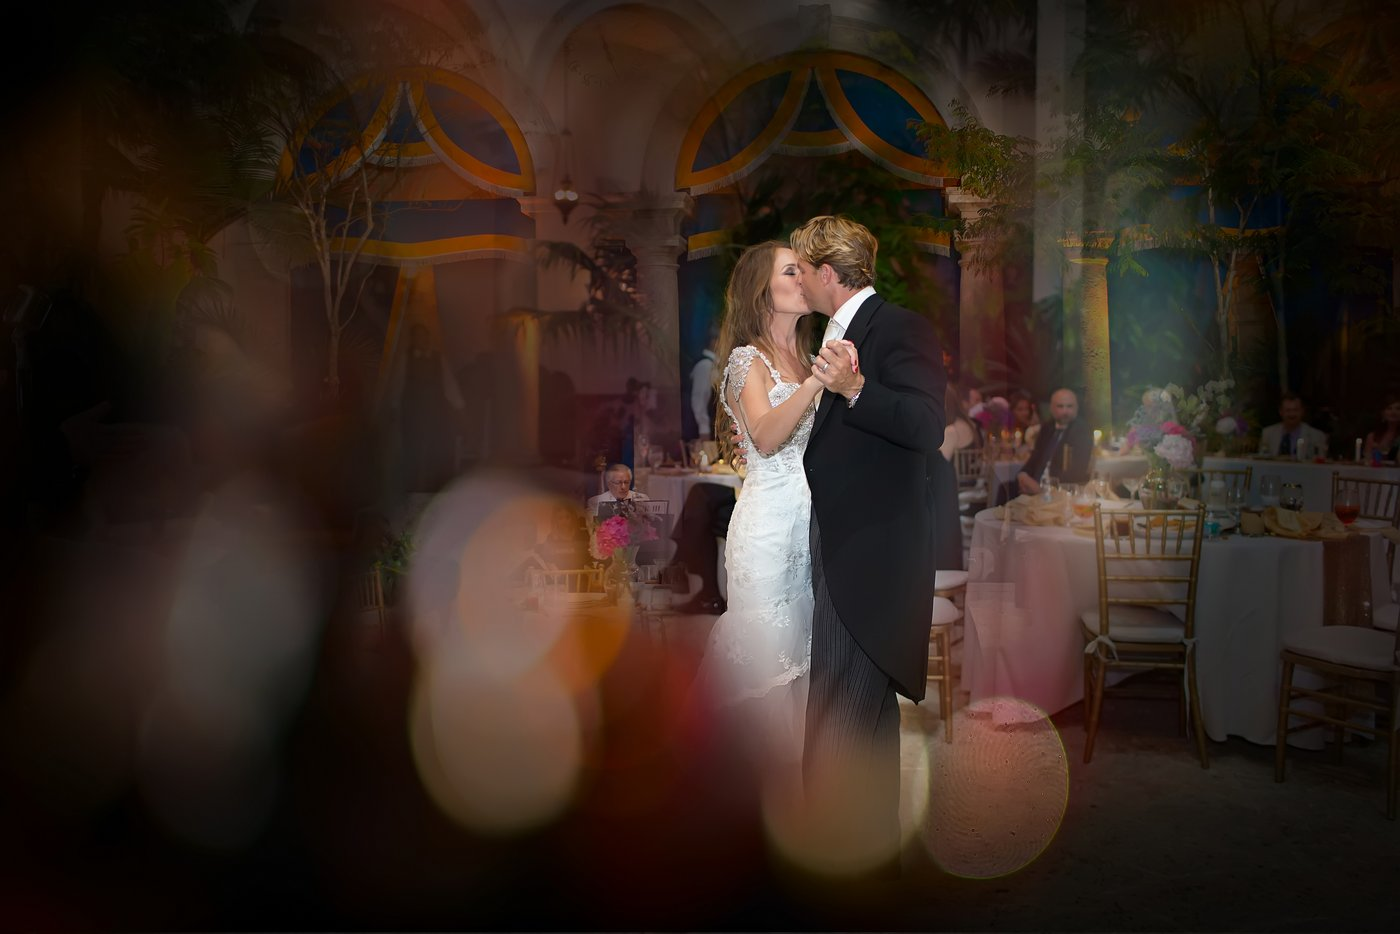 Jon + Melissa's Wedding   Vizcaya Museum and Gardens  Miami, FL, Miami Wedding Photographers   Häring Photography, Indian Wedding Photographer in Florida, Best Muslim, Hindu - South East Asian Wedding Photographers